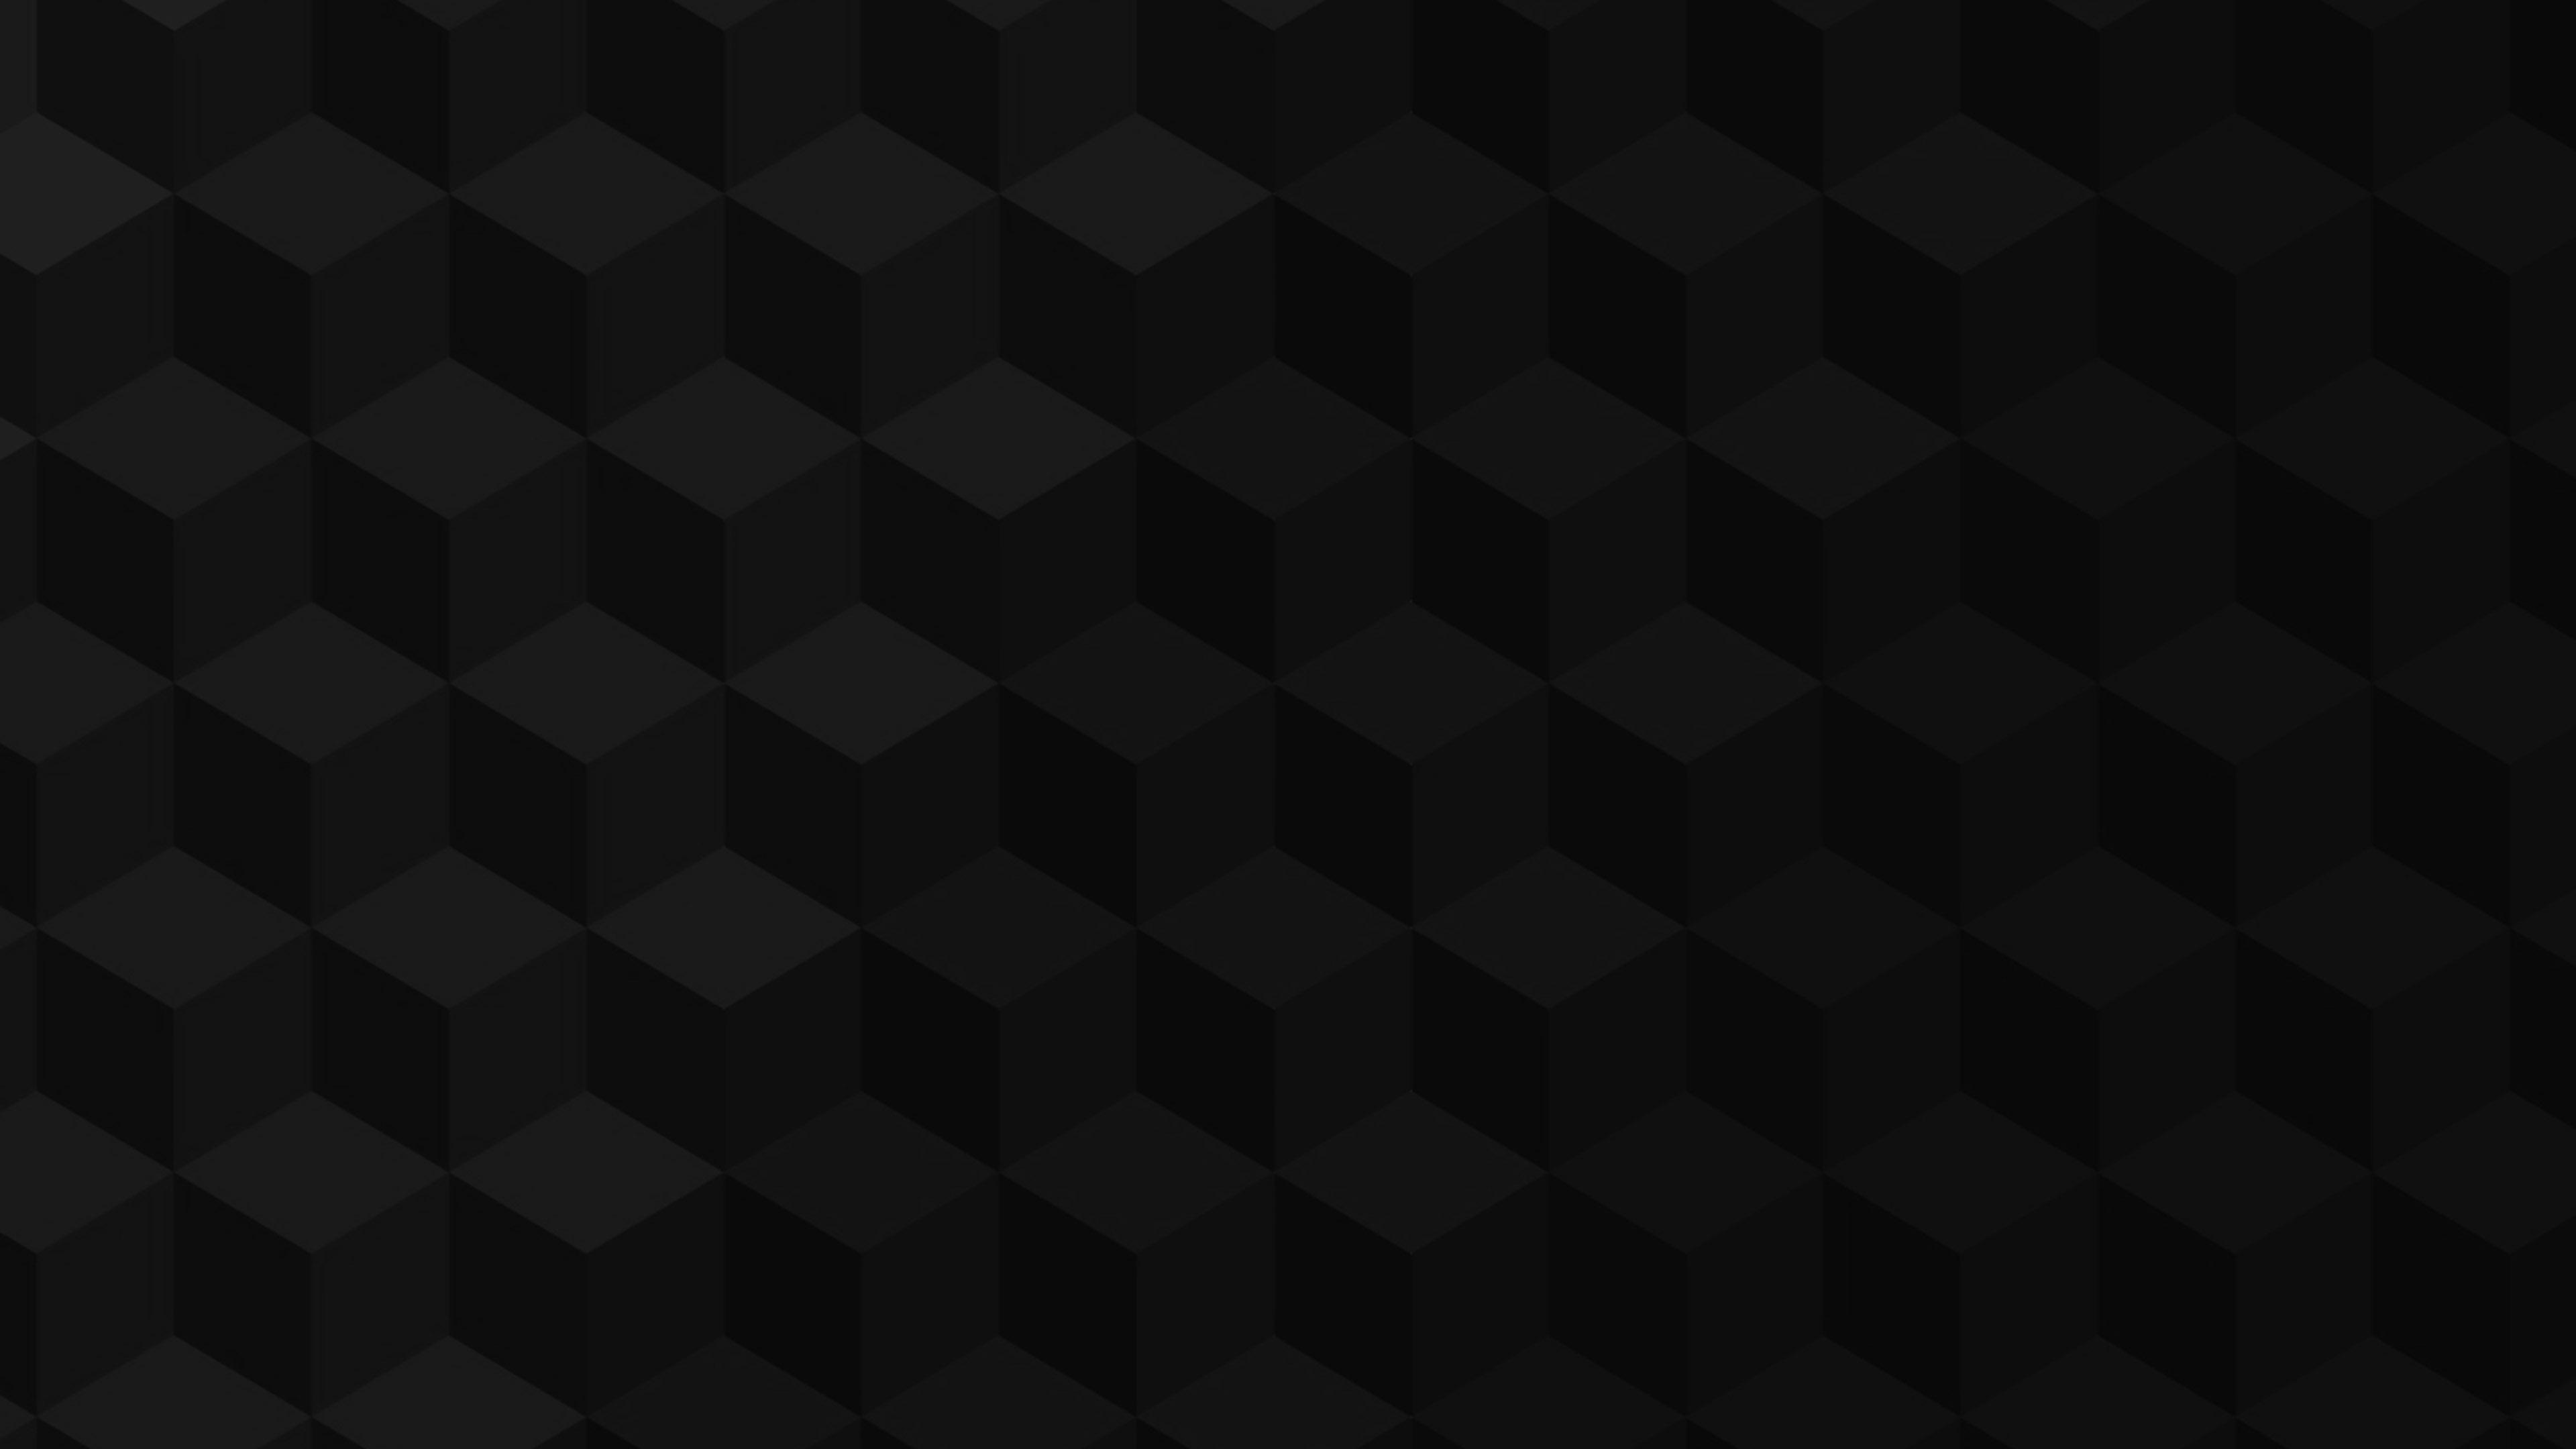 Ve03 Cube Shadow Dark Pattern Art Papers Co